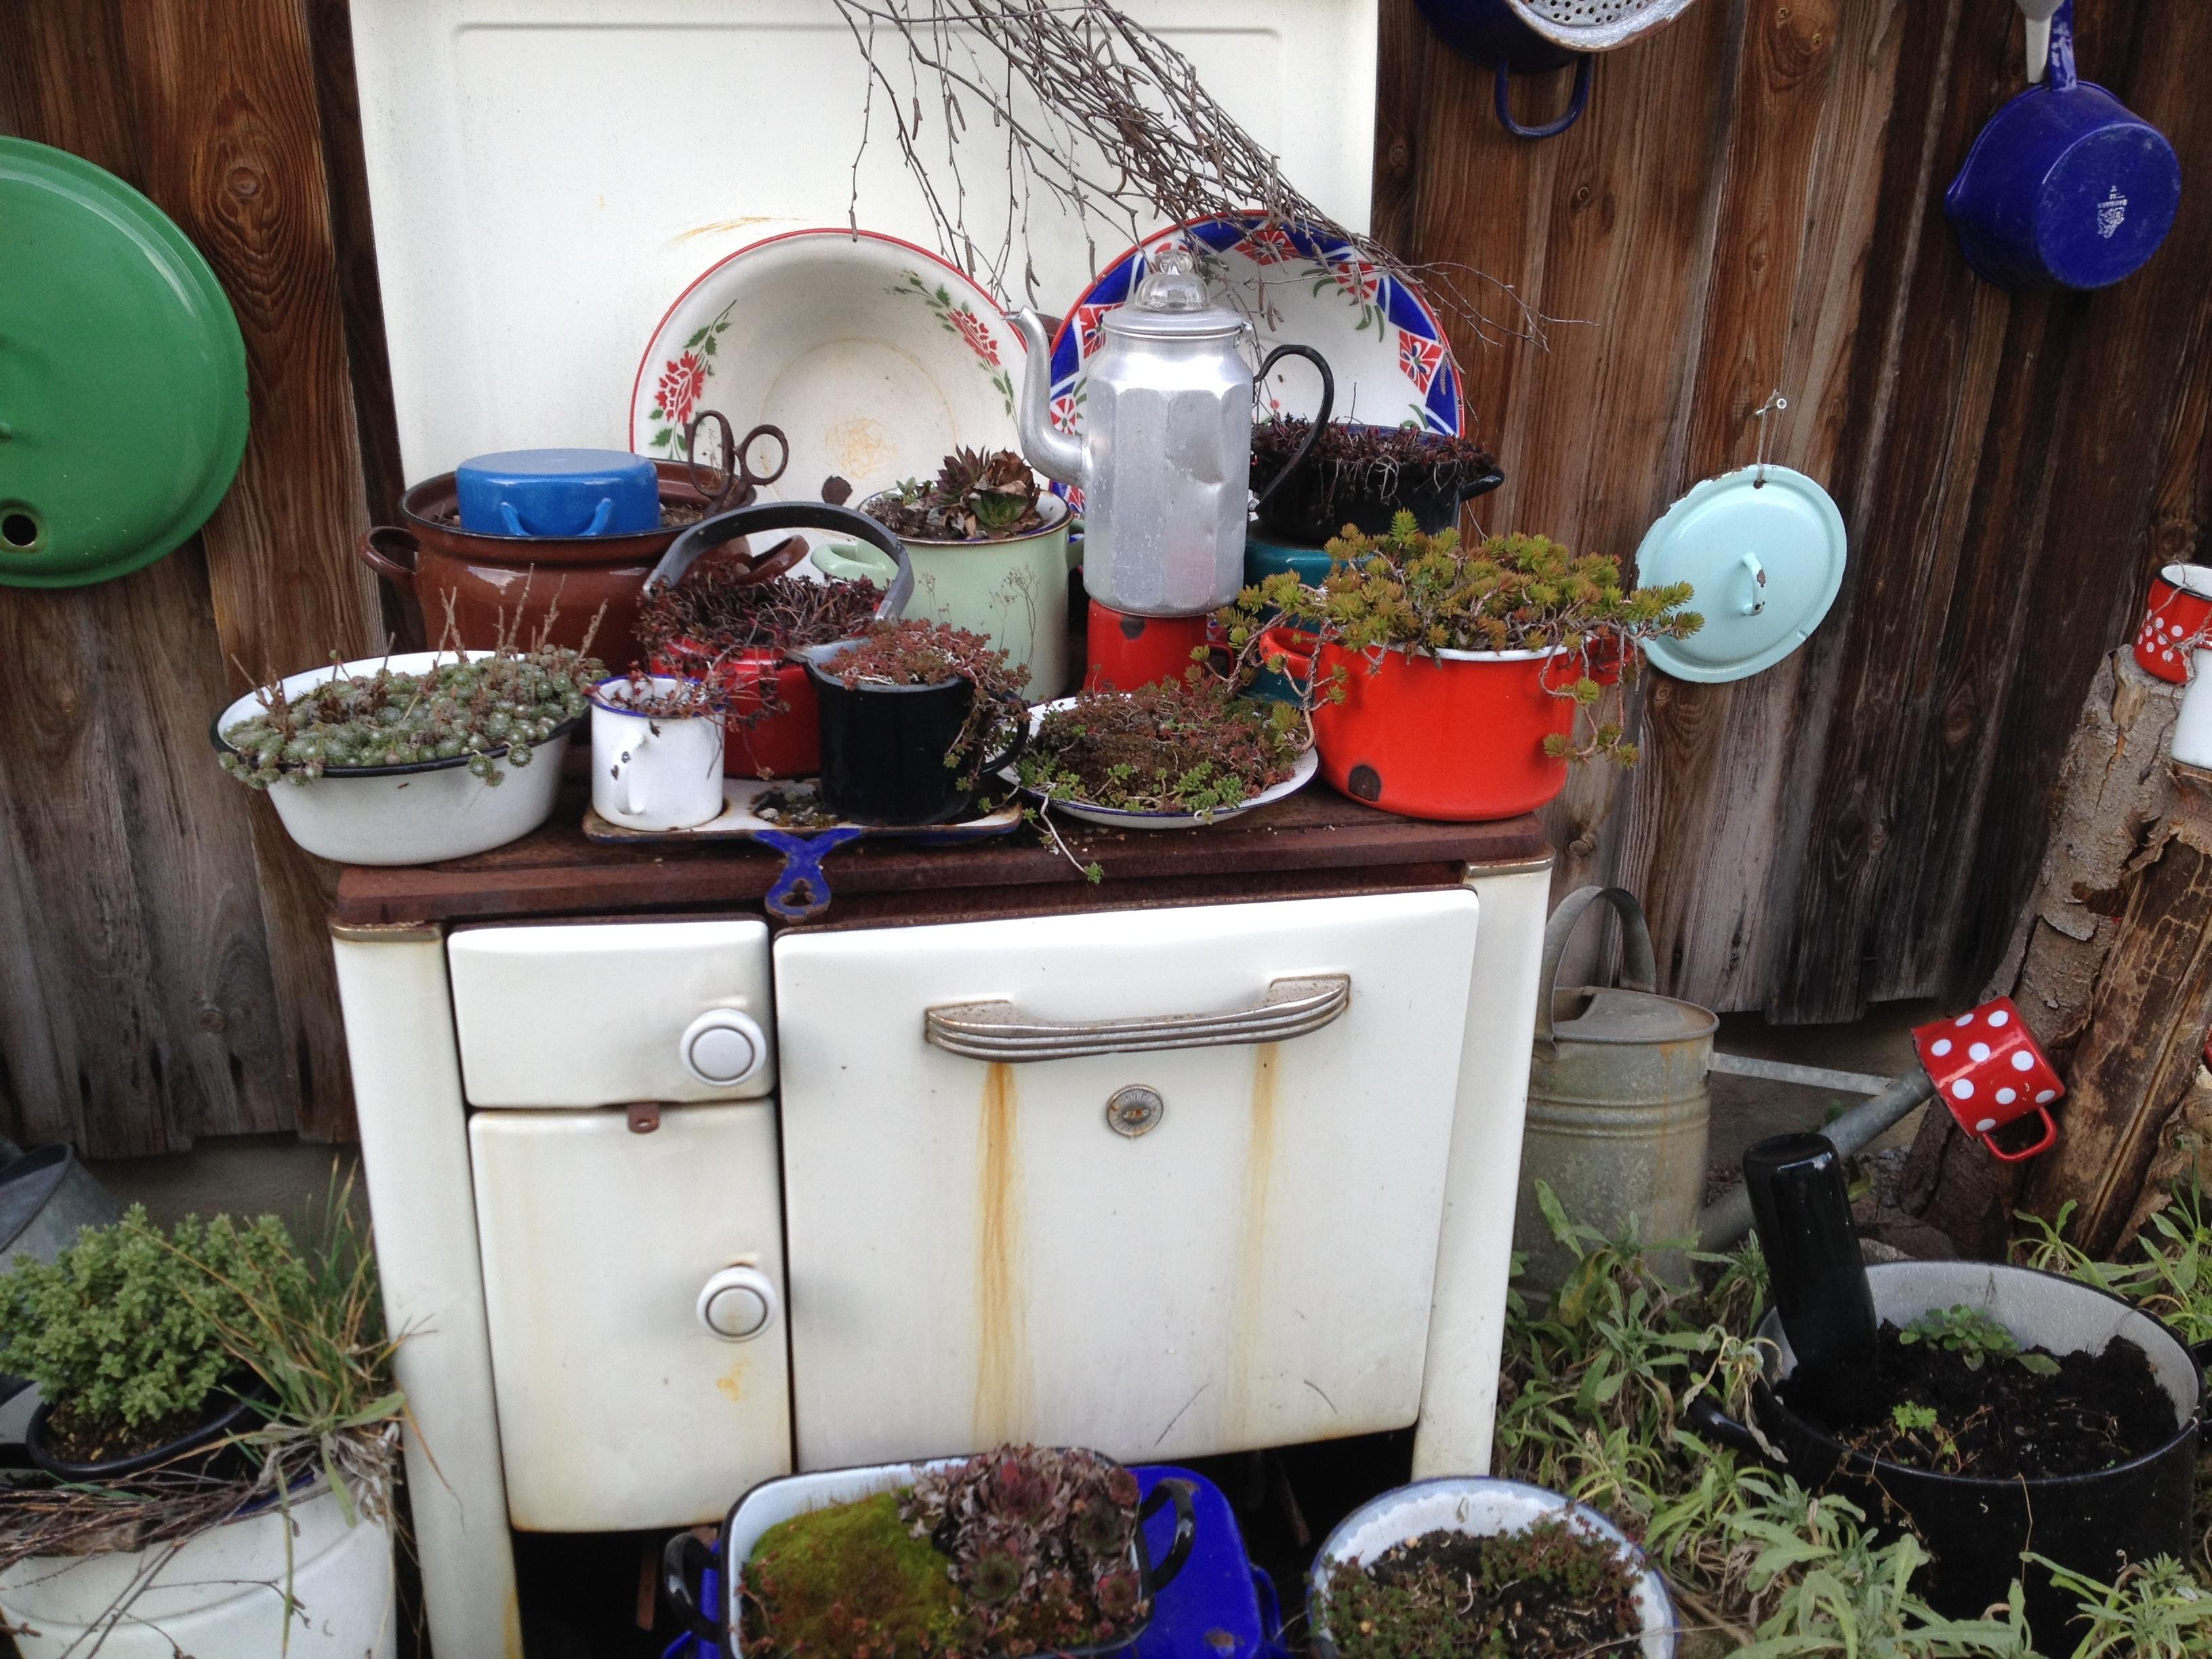 Gratis afbeeldingen : bloem oud huis achtererf meubilair kamer